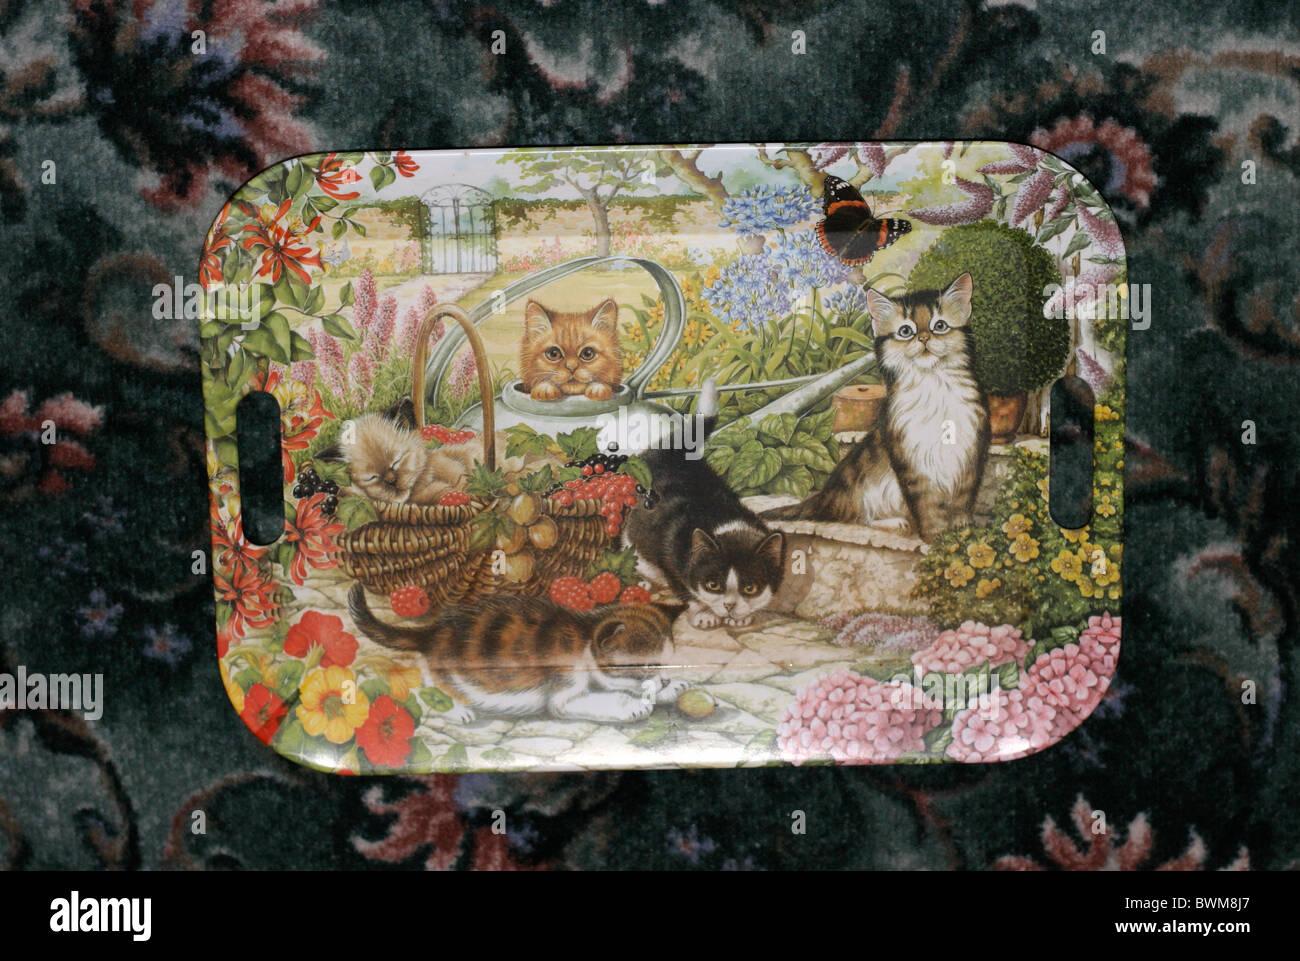 Kitsch tray - Stock Image